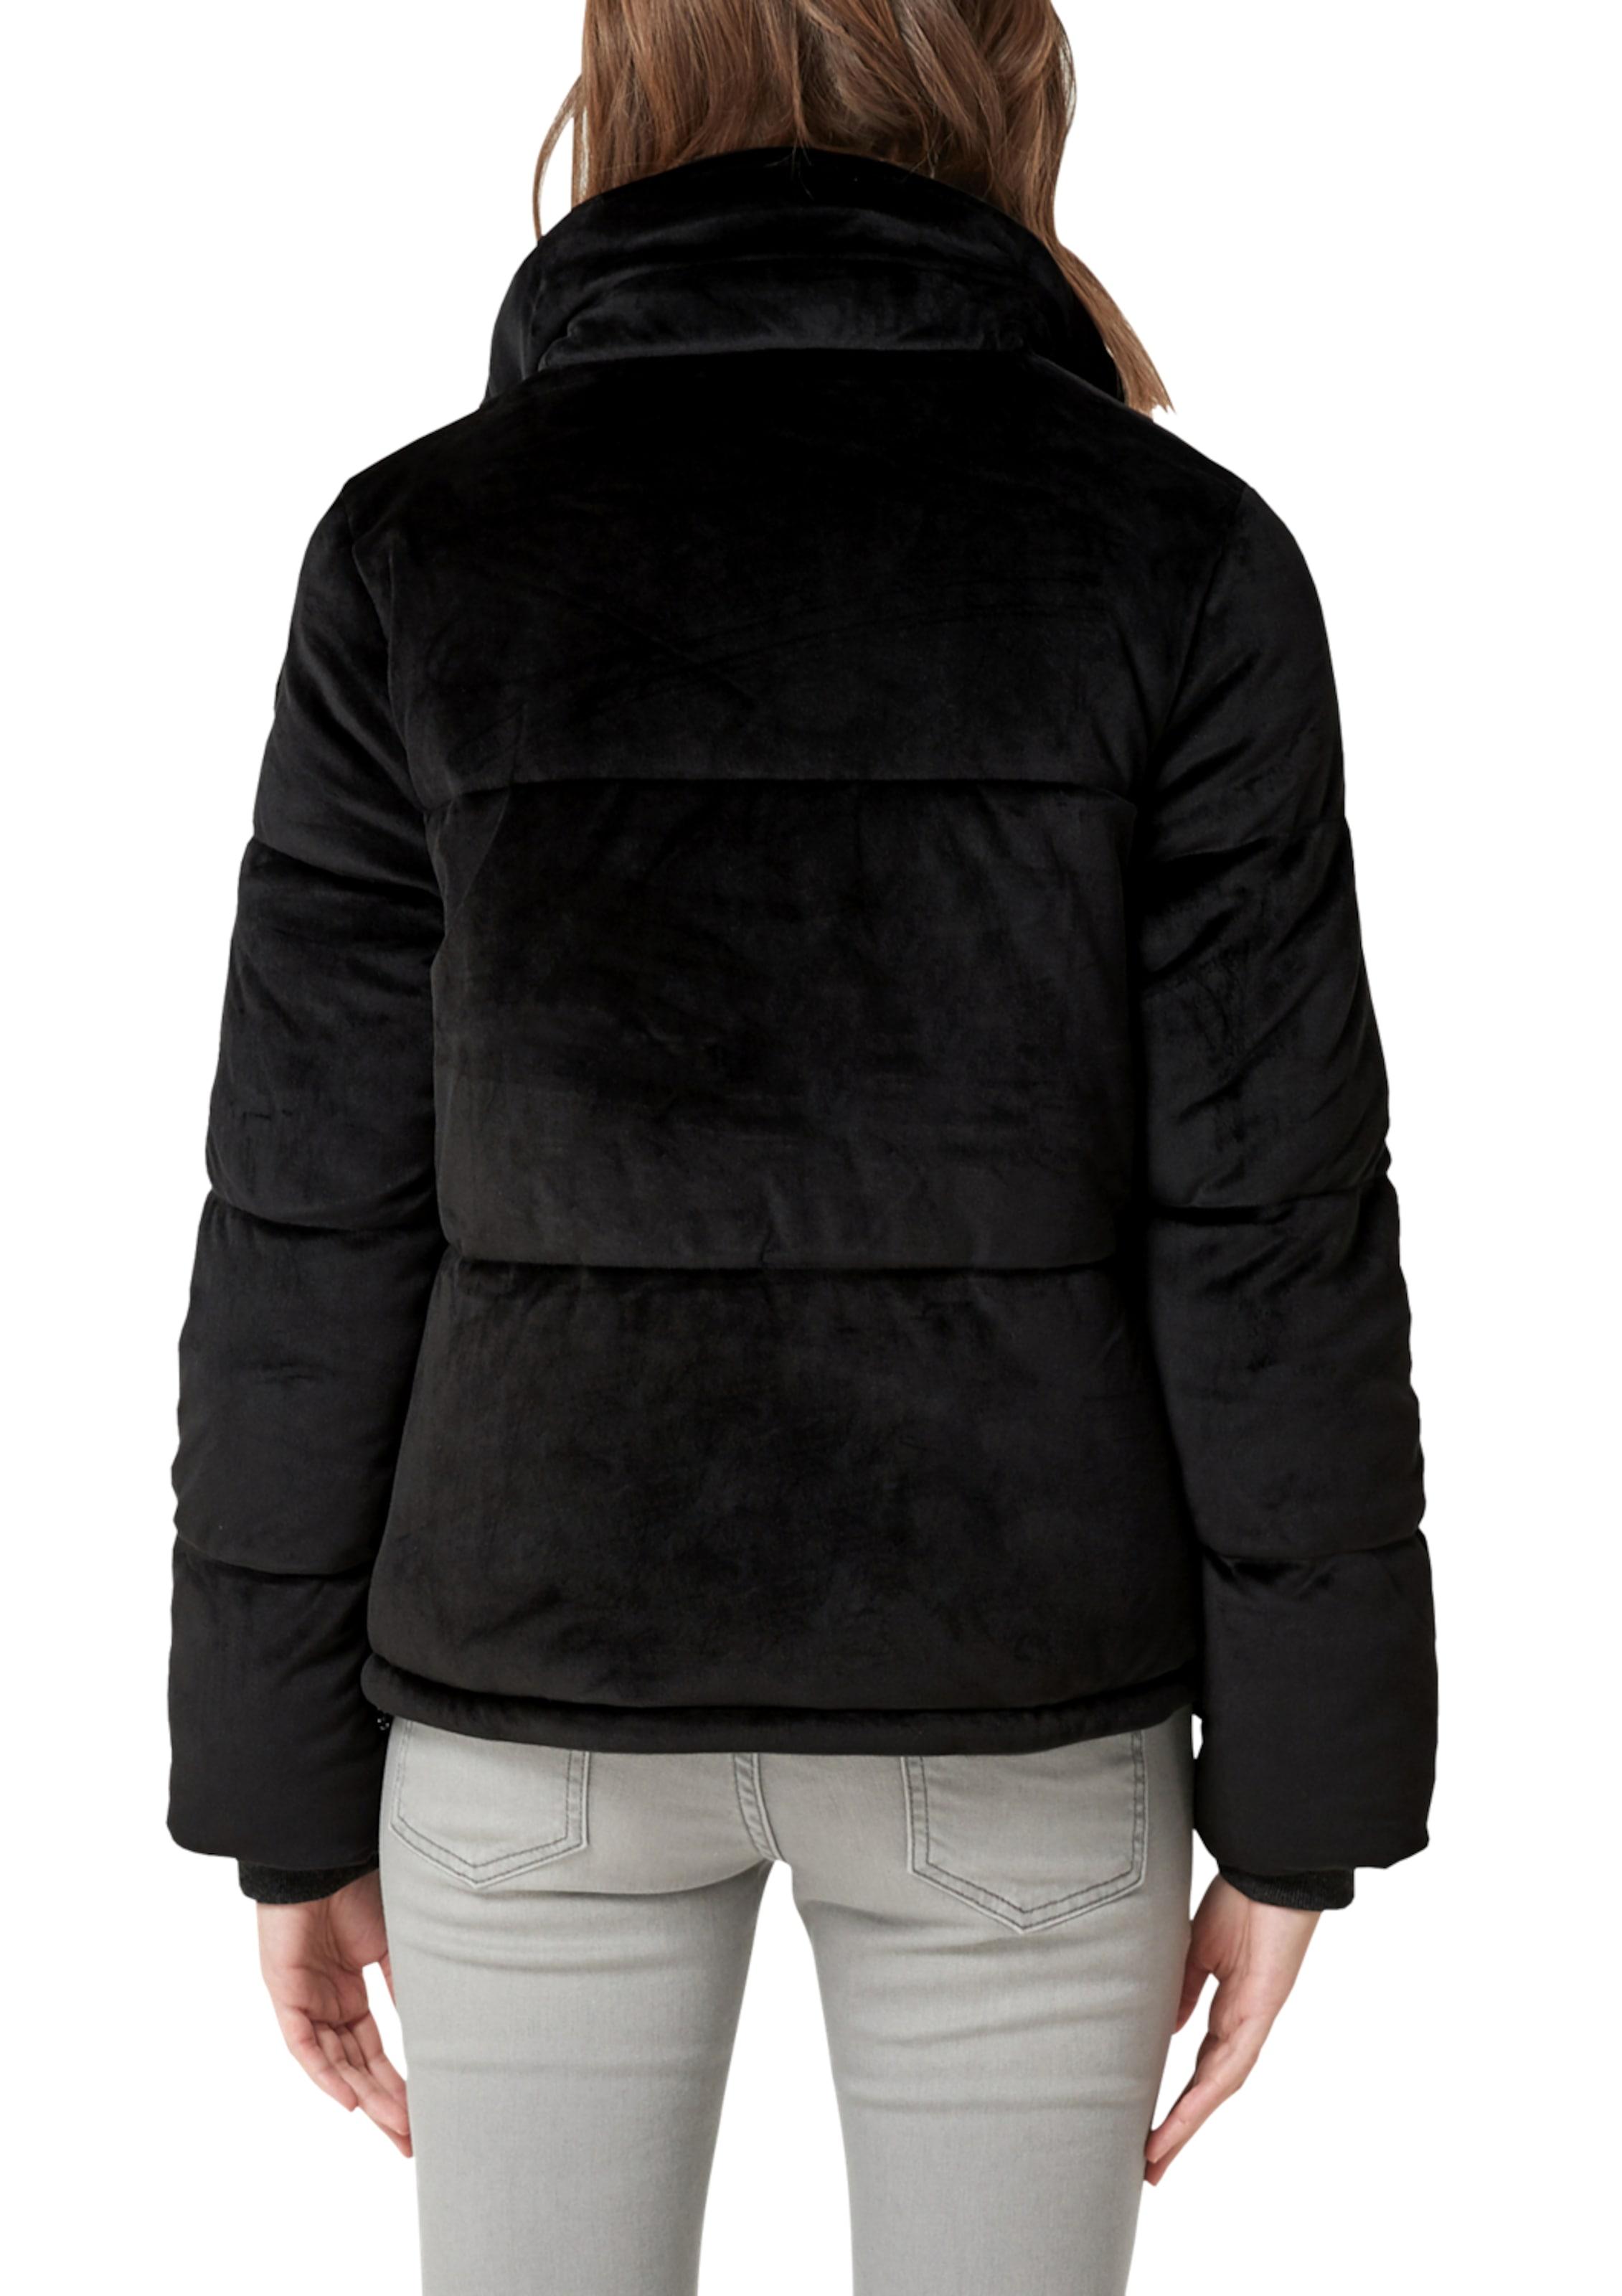 Aus Puffer Samt Jacket Schwarz oliver In S Red Label m8nvNw0